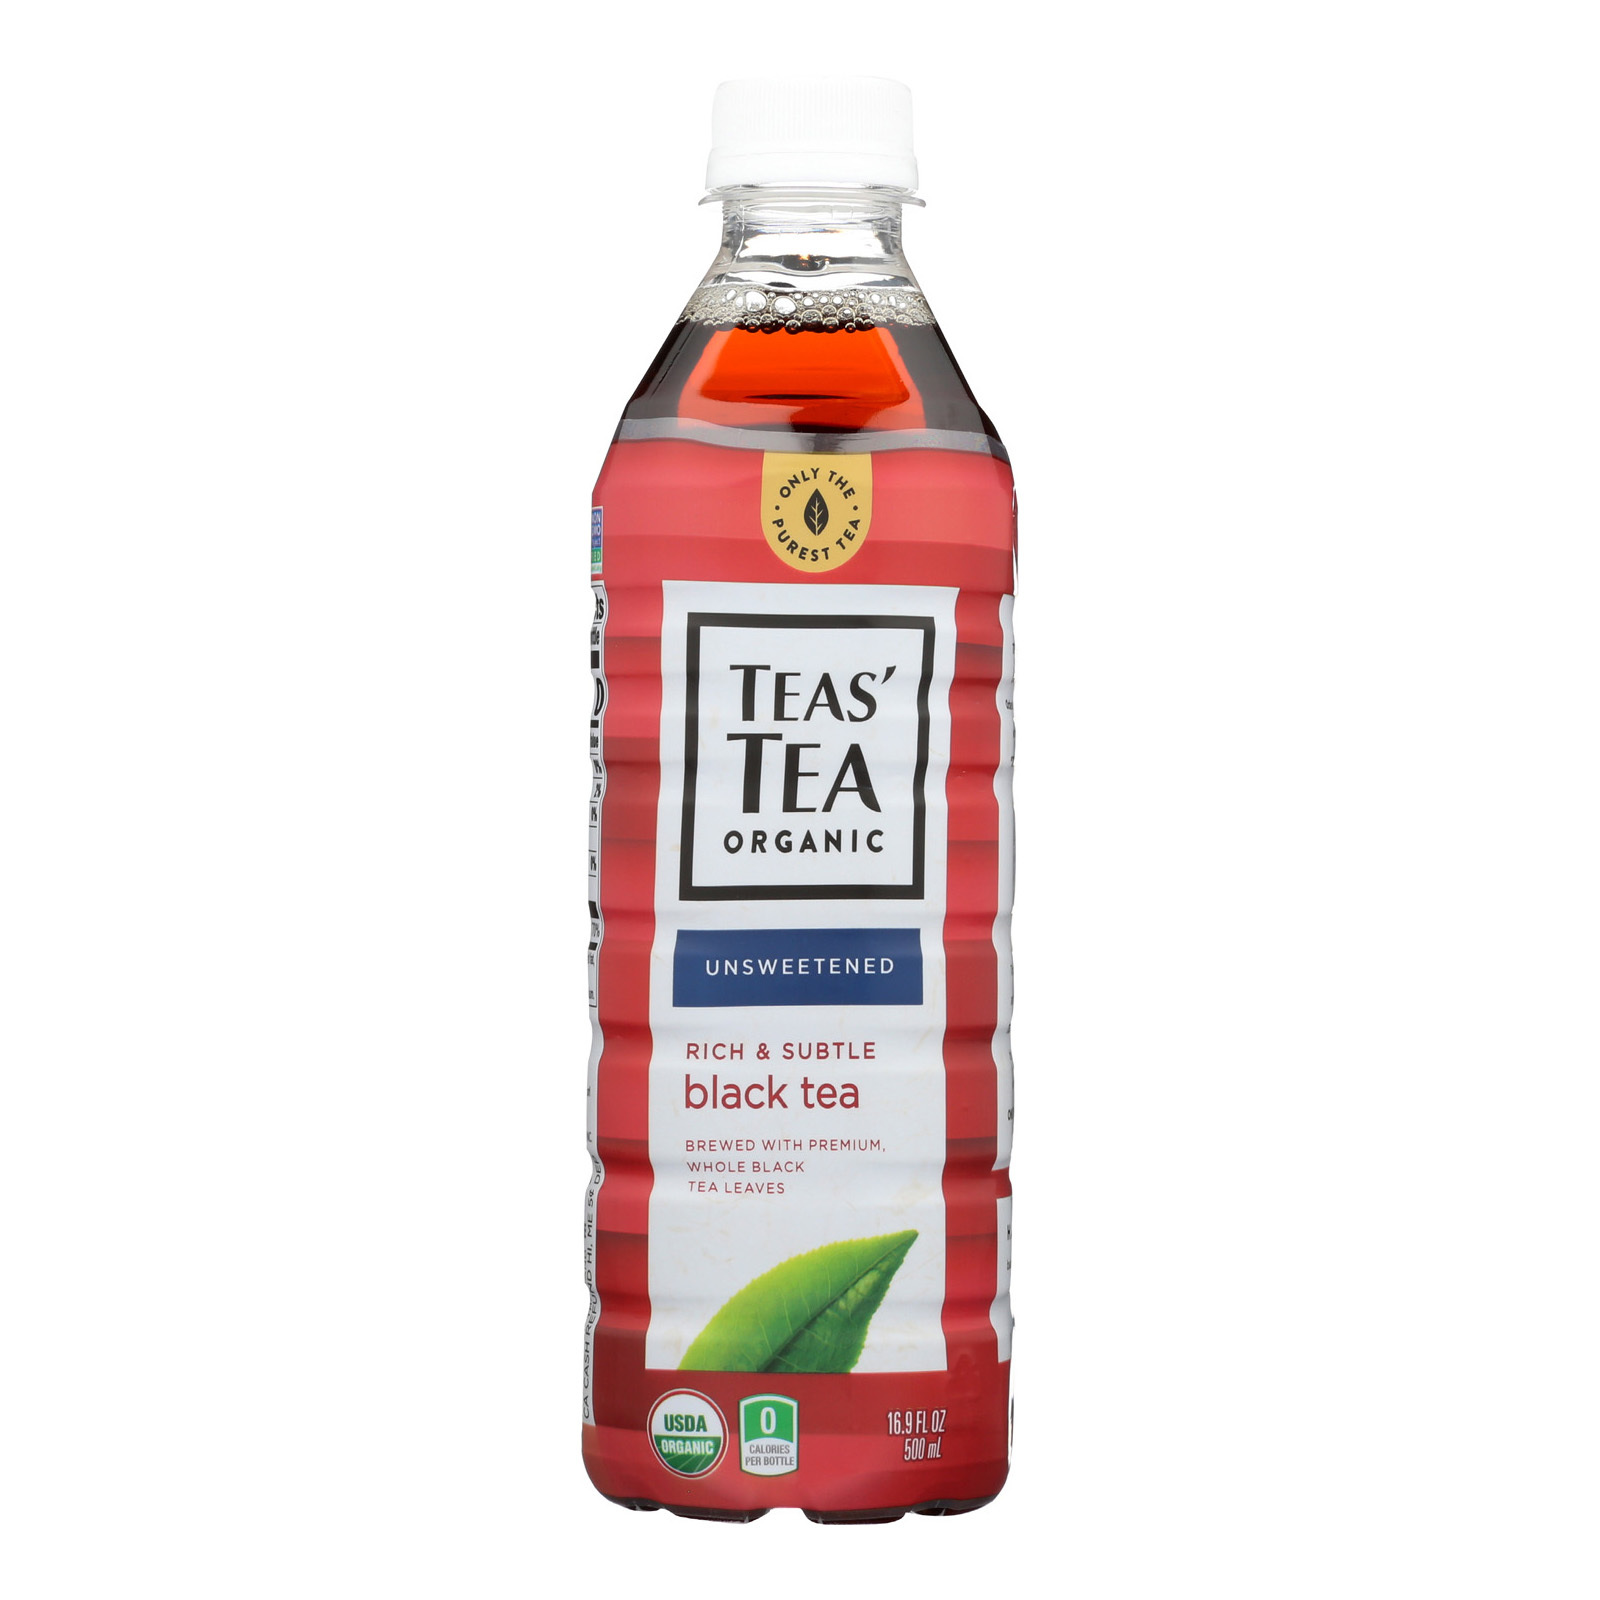 Tea's Organic Black Tea - Unsweetened - Case of 12 - 16.9 Fl oz.